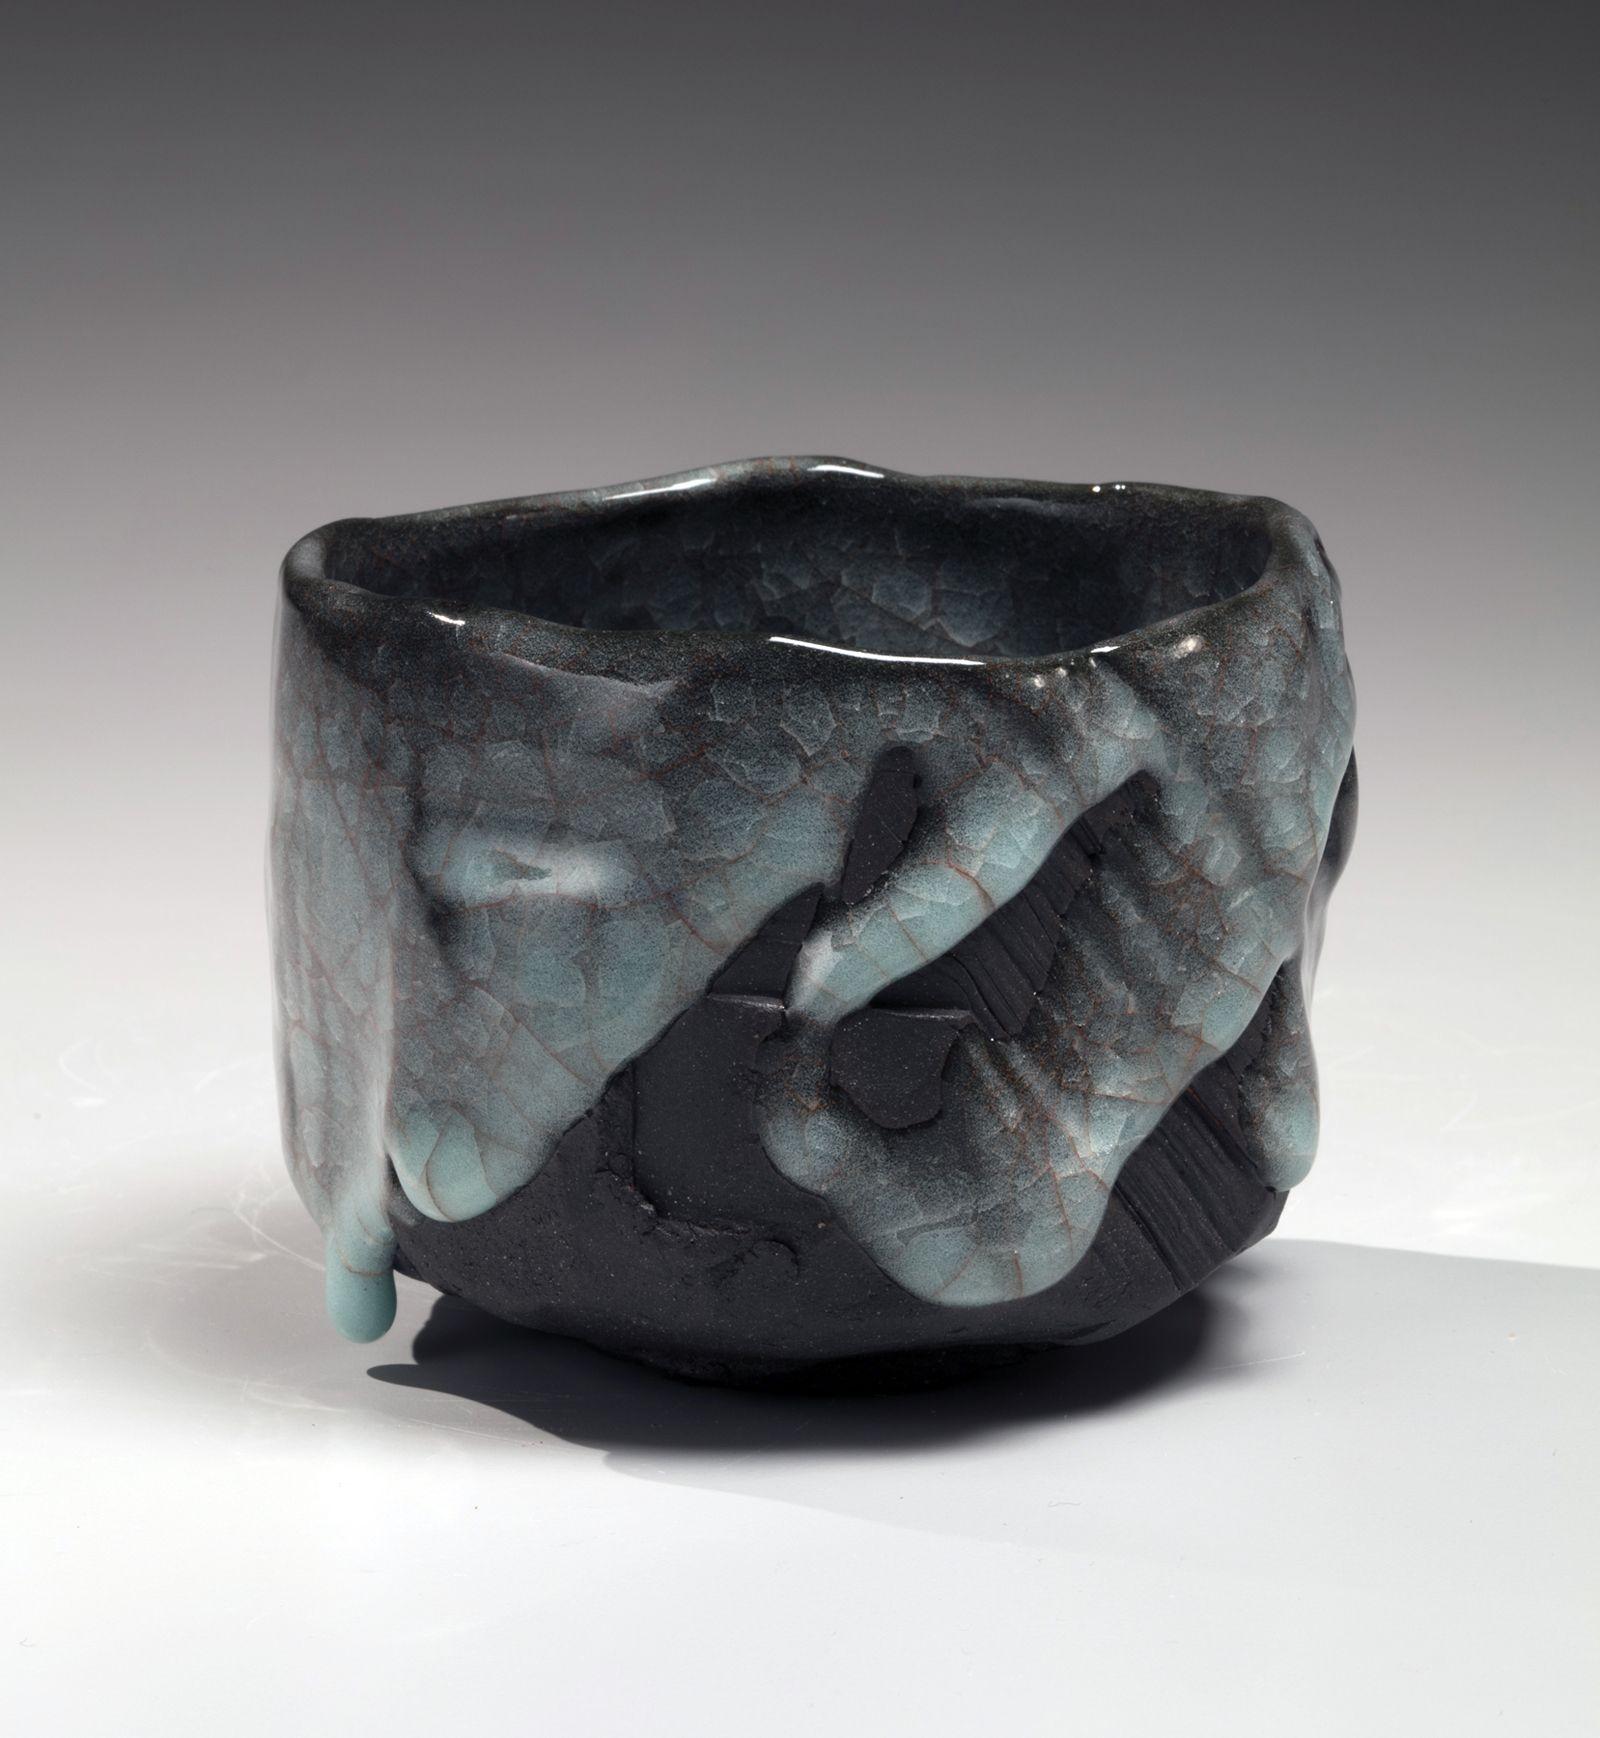 Uraguchi Masayuki (b. 1964), Straight sided teabowl with irregular mouth